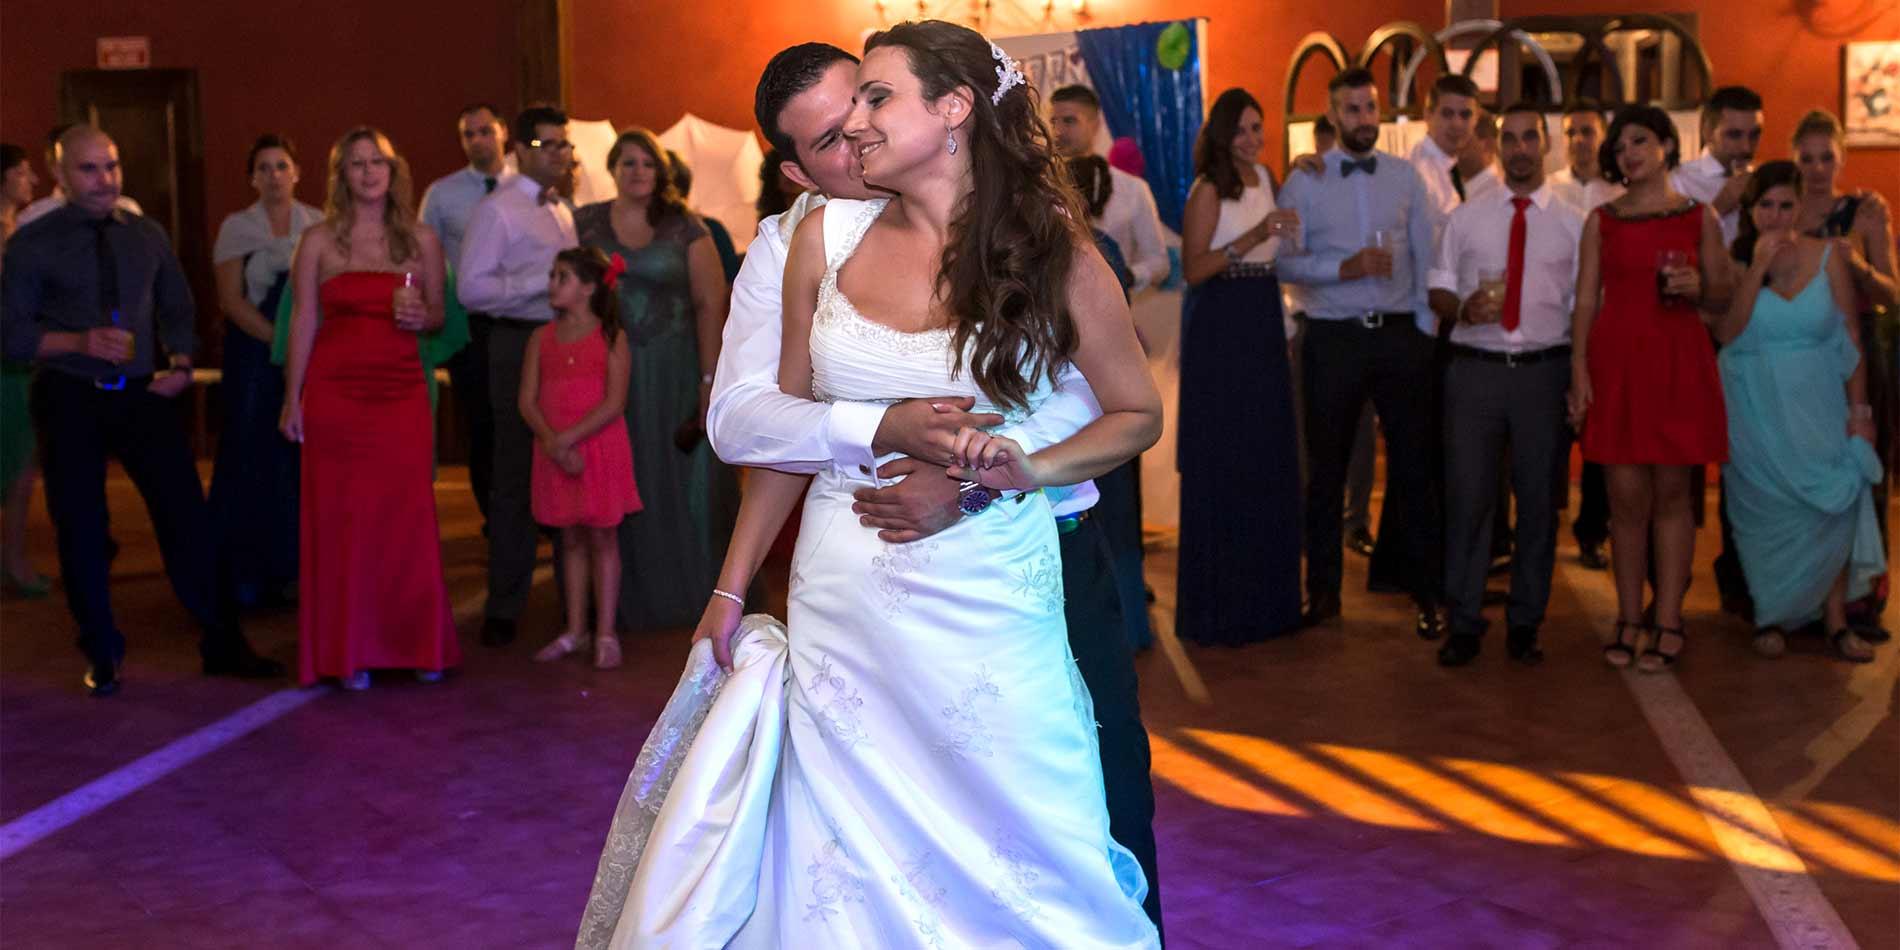 Fotógrafo de bodas, Baile nupcial de una boda en Córdoba